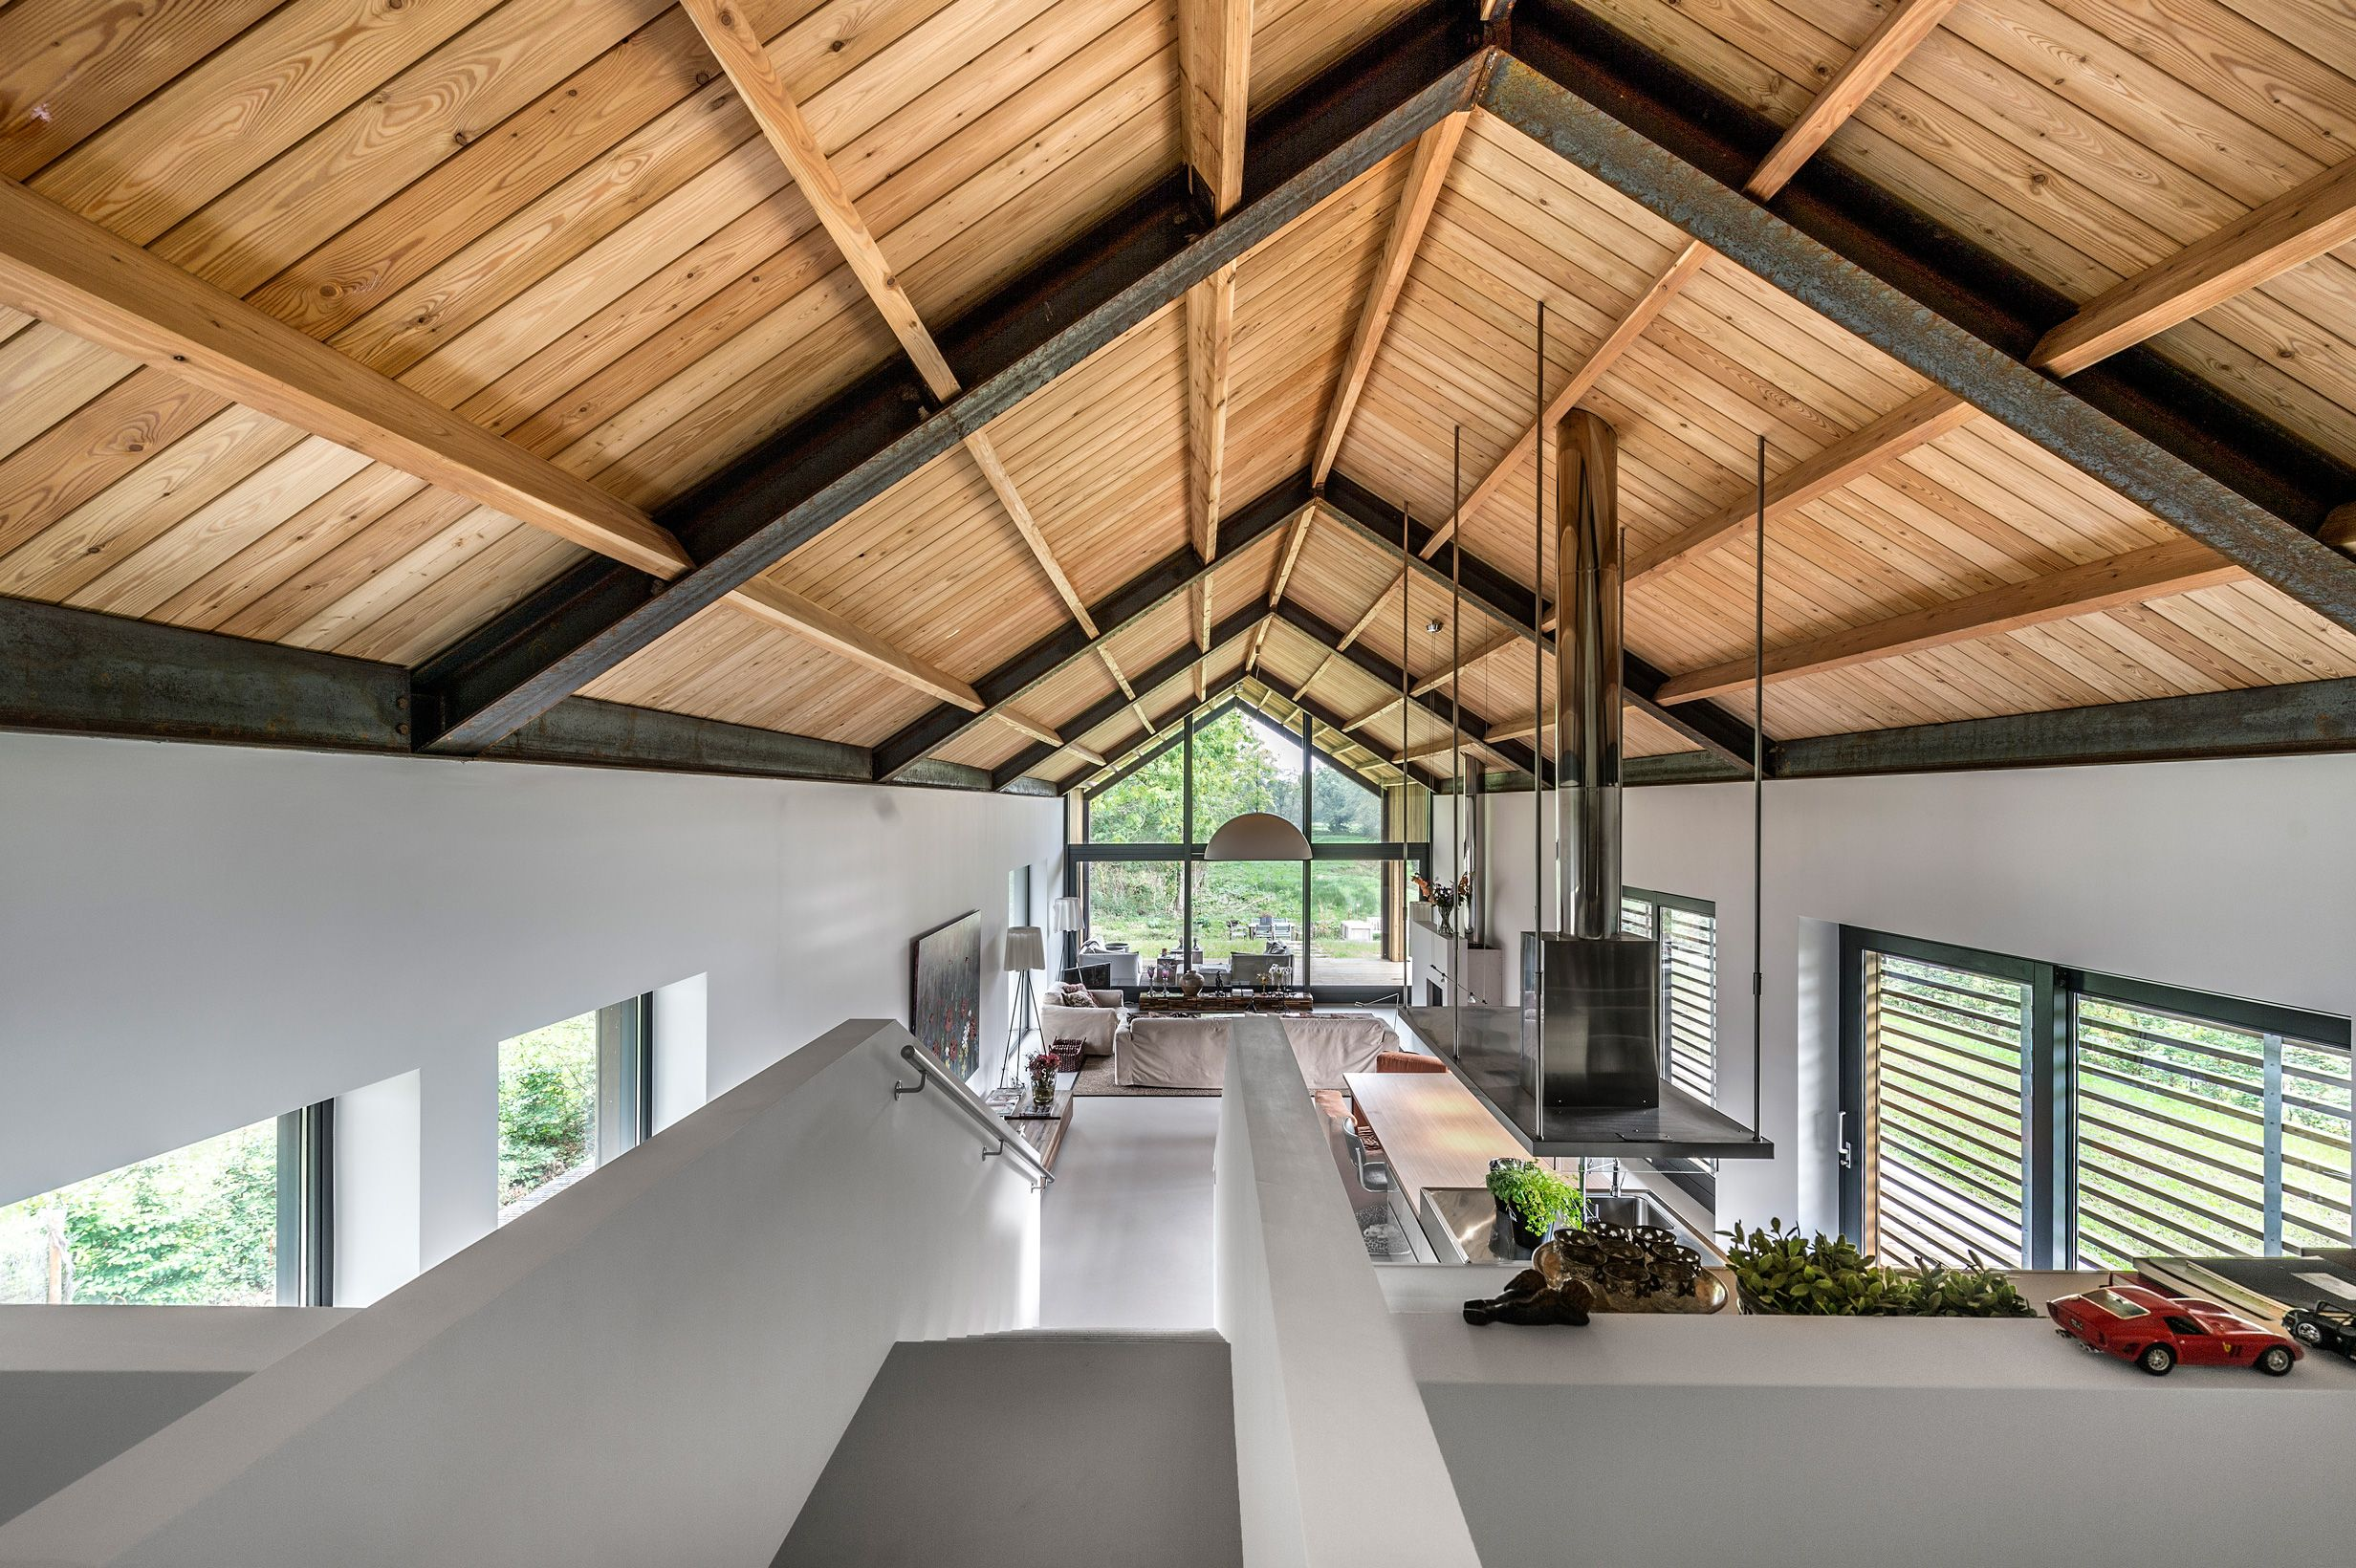 201109 schuurwoning | ARCHITECTUURSTUDIO SKA | house to build ...